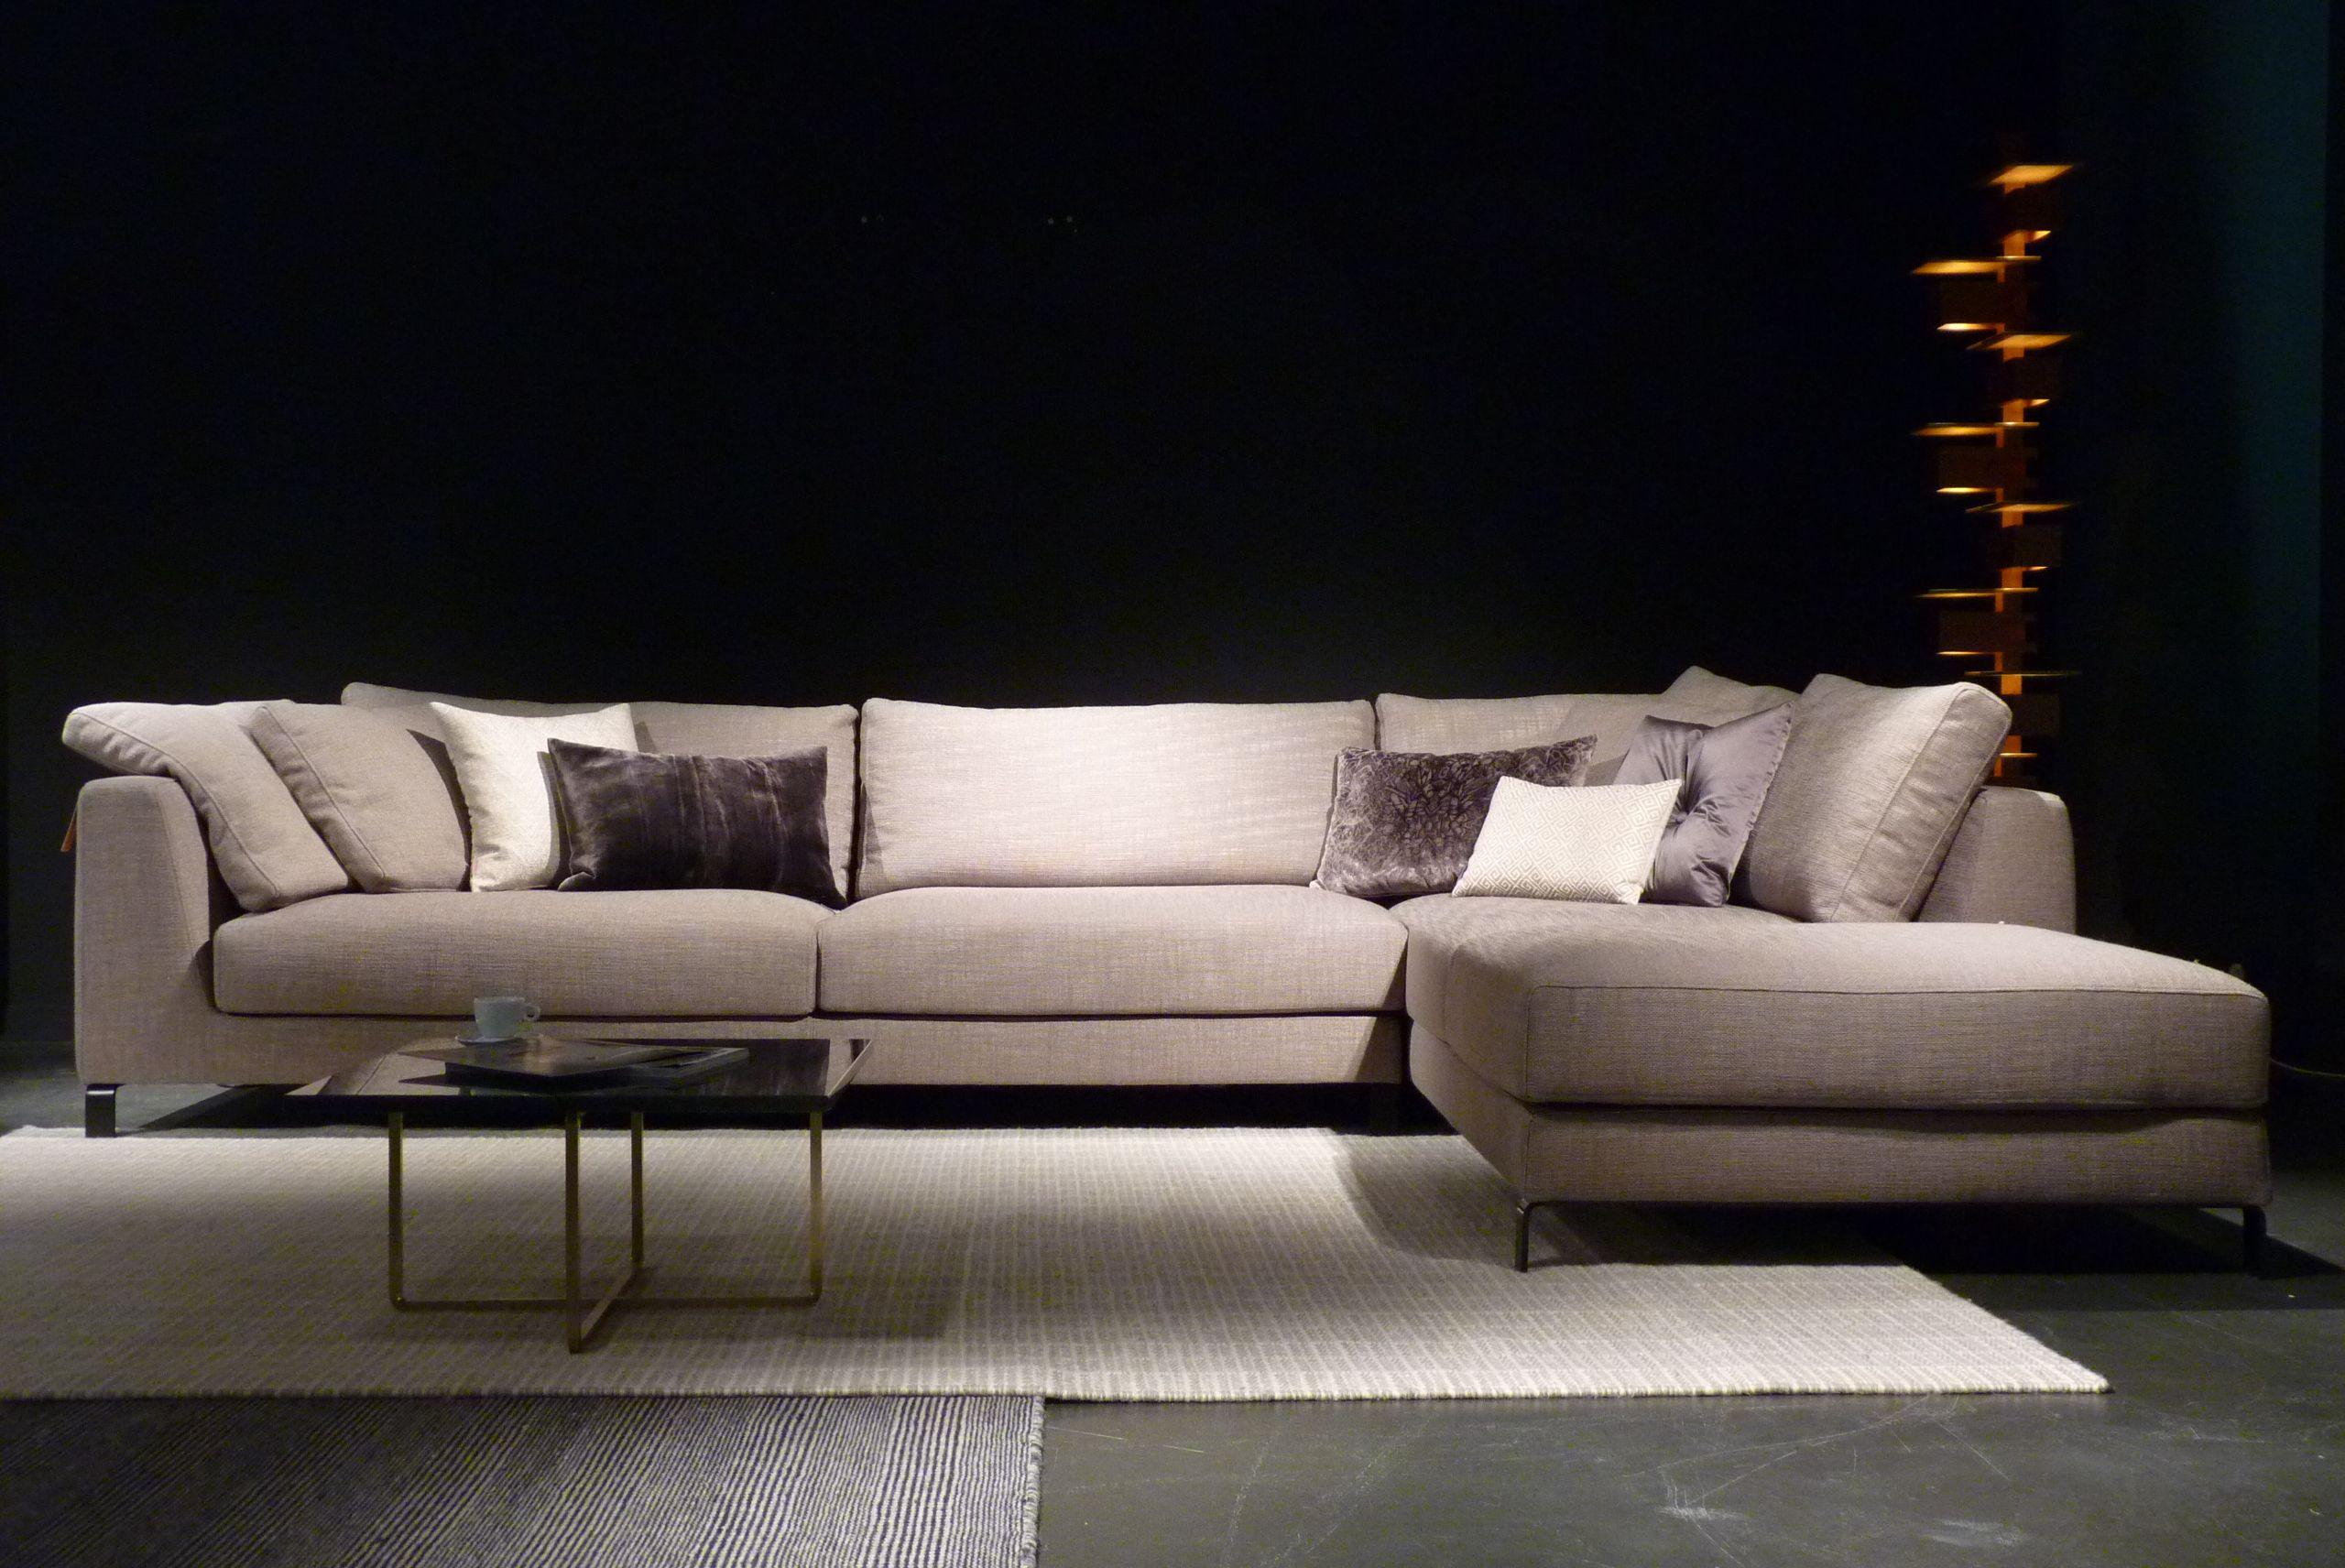 Molinari Sedie ~ Pin by left label collections on danca lifetime comfort pinterest